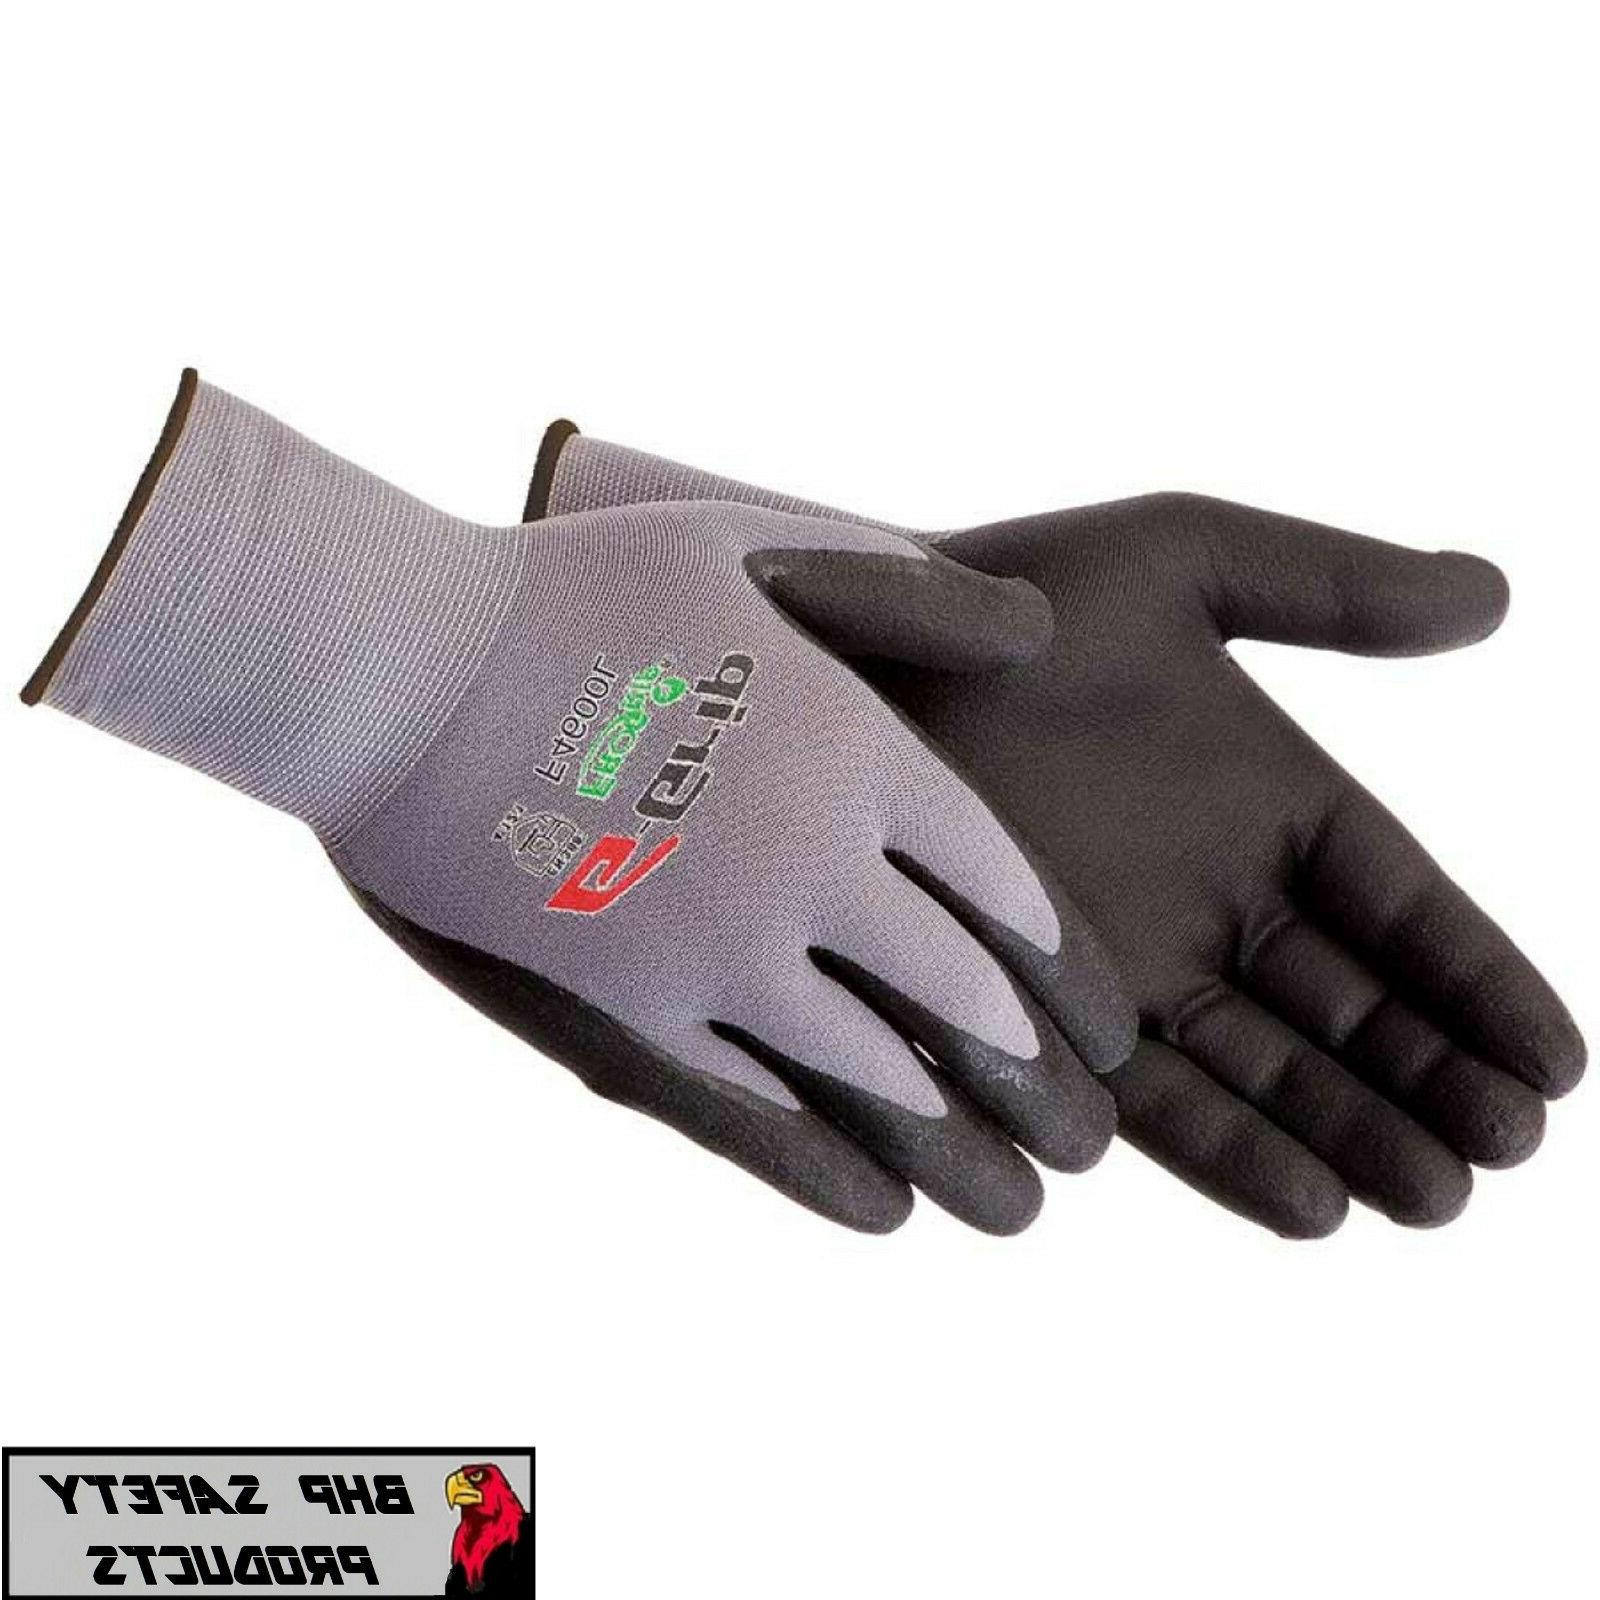 liberty g grip work gloves foam nitrile